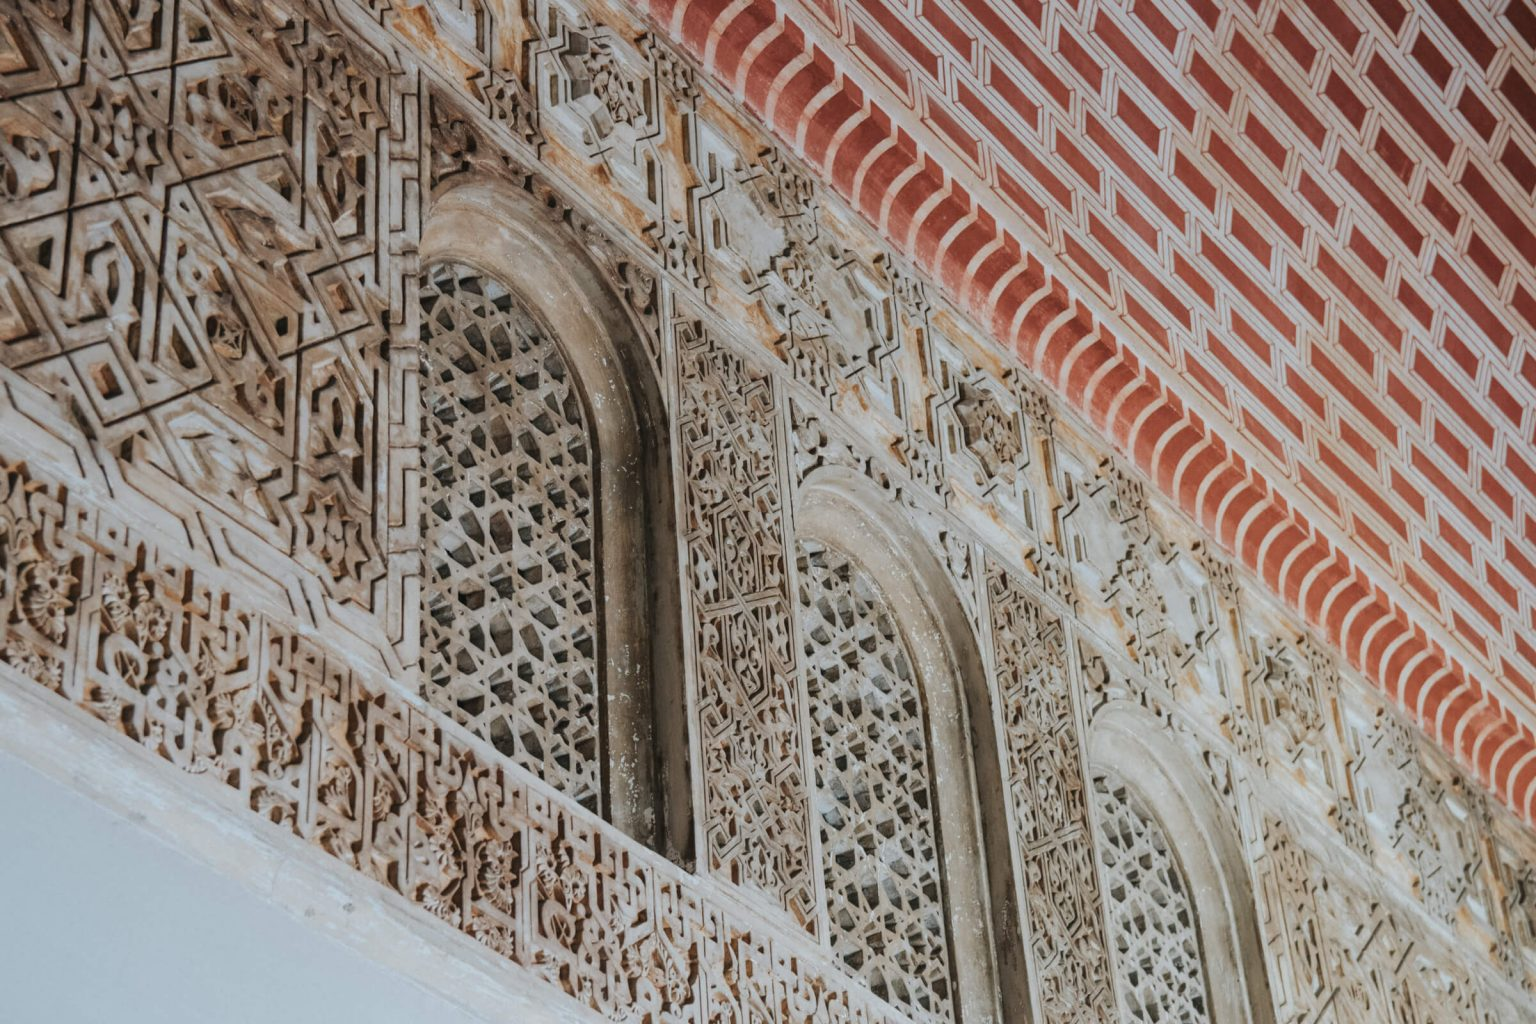 Alcazaba Detailing